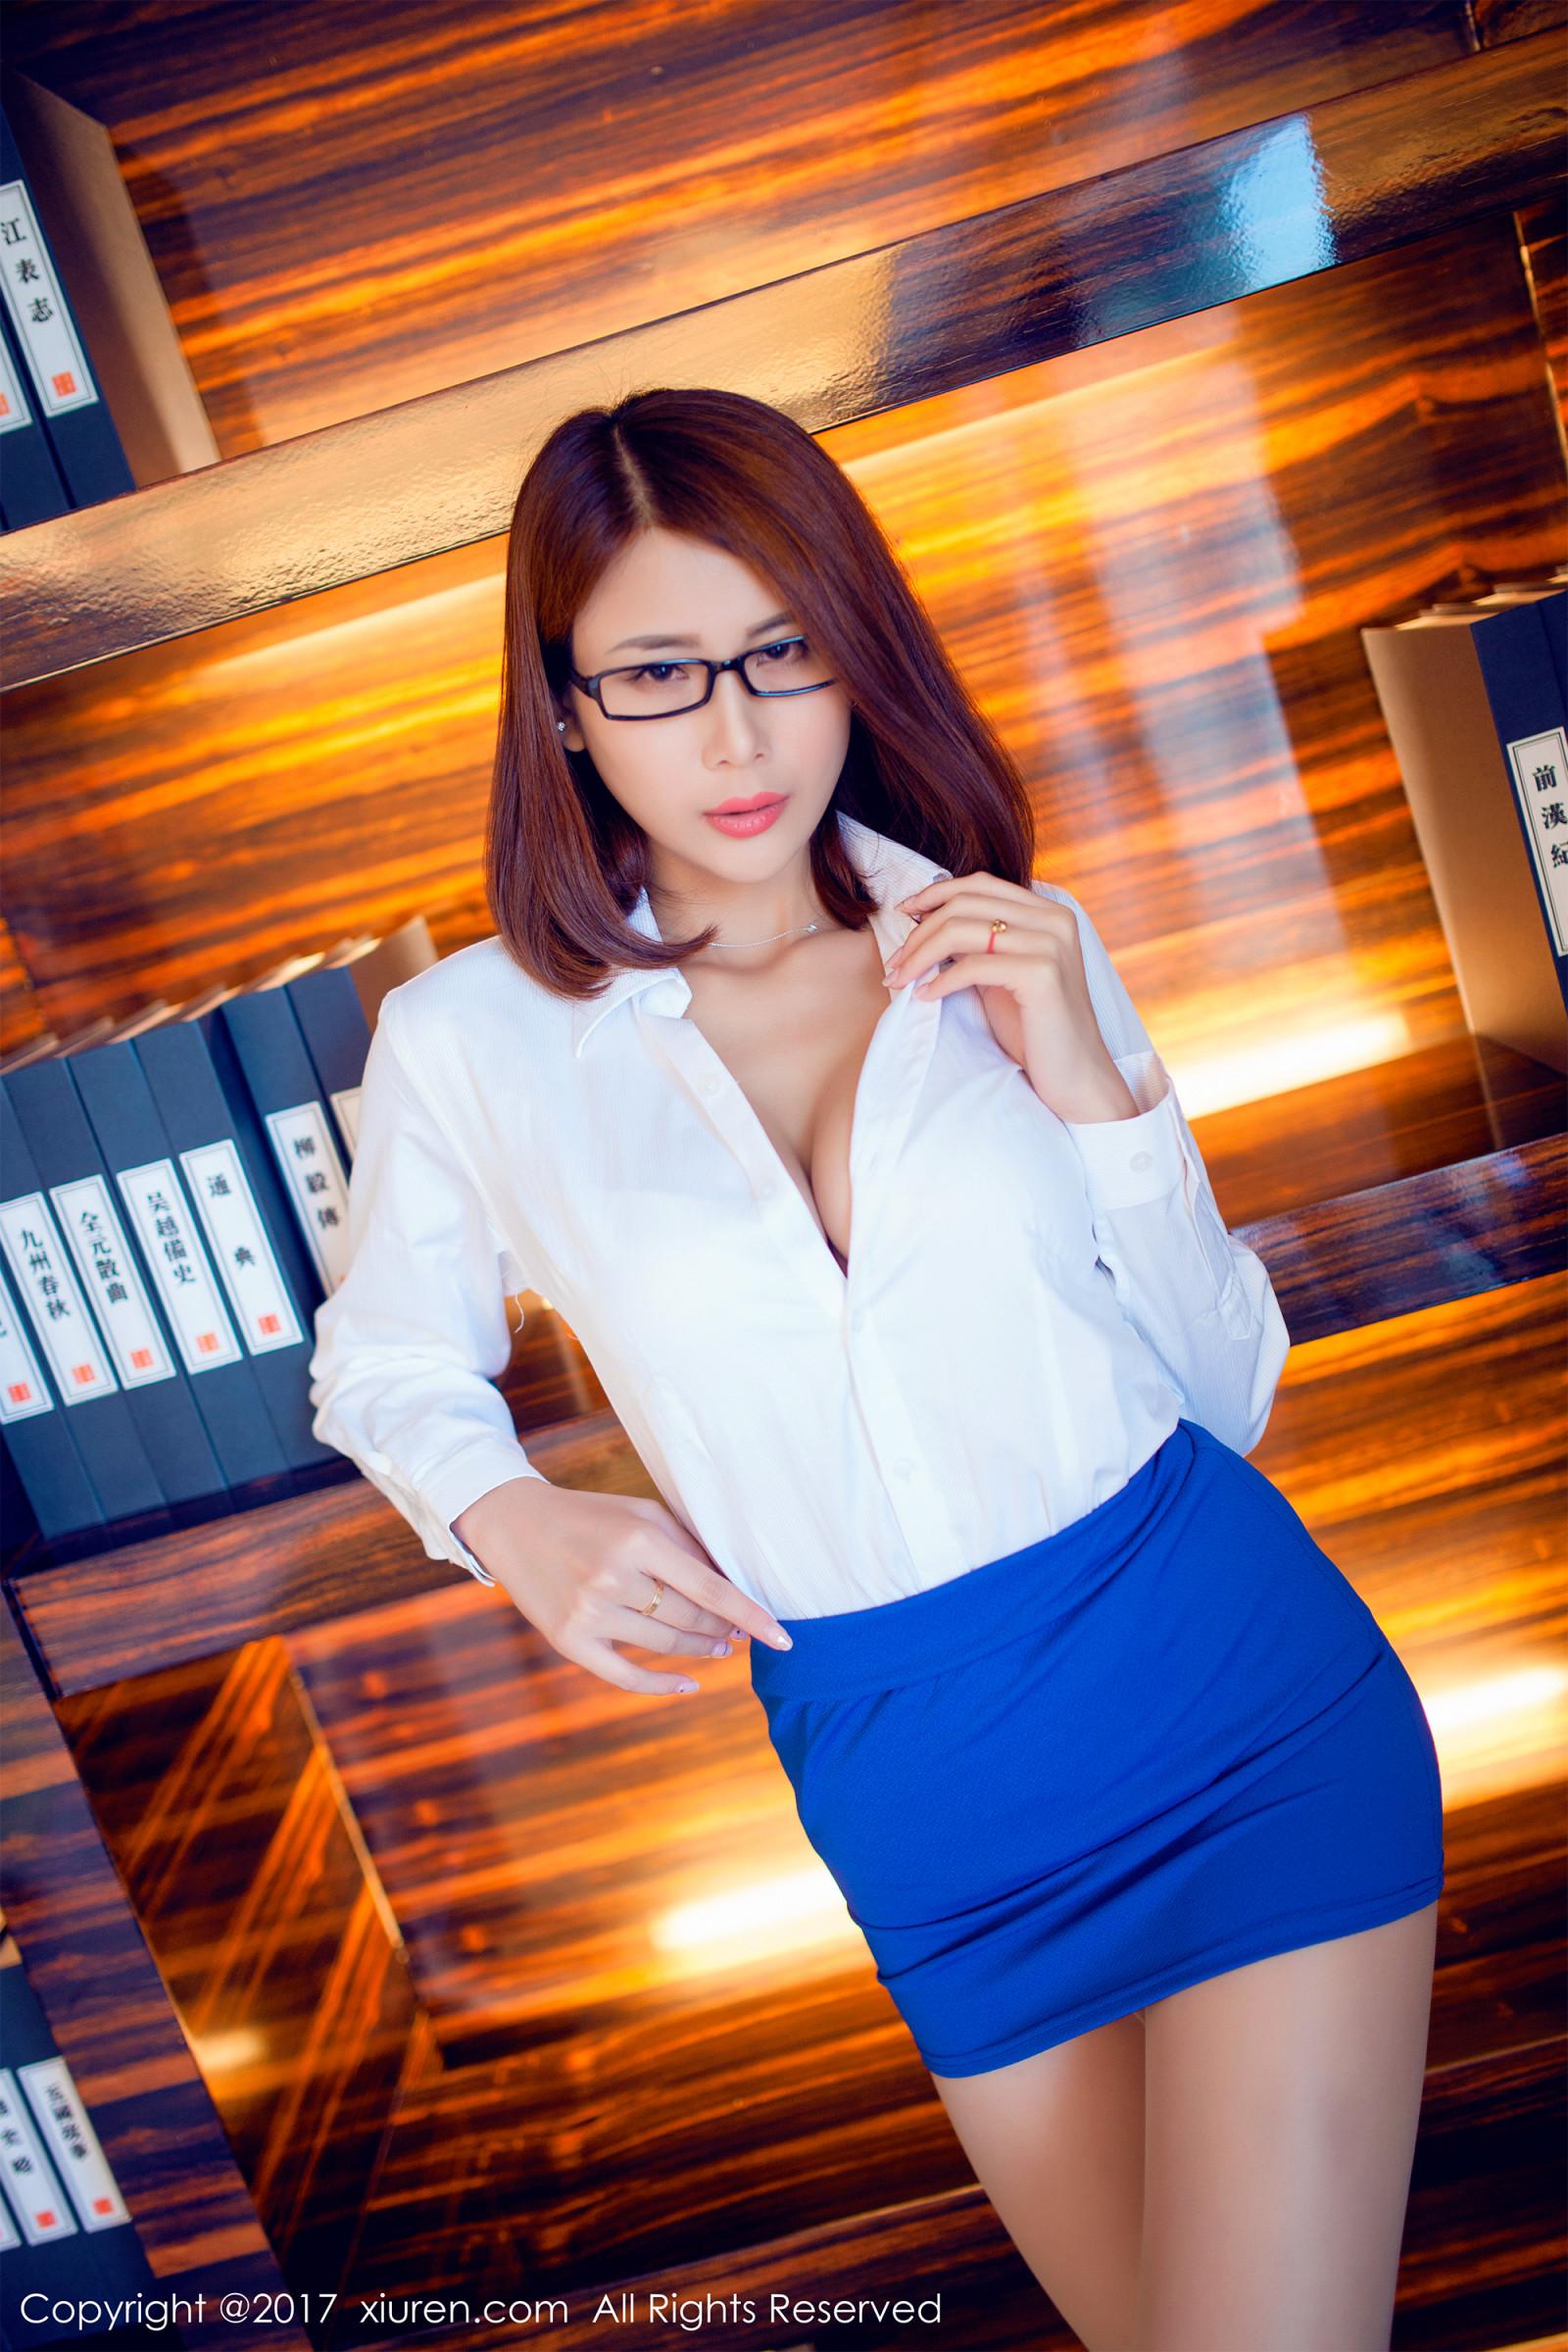 Girl With Glasses Wallpaper Wallpaper Office Girl Open Shirt Cleavage Blue Skirt